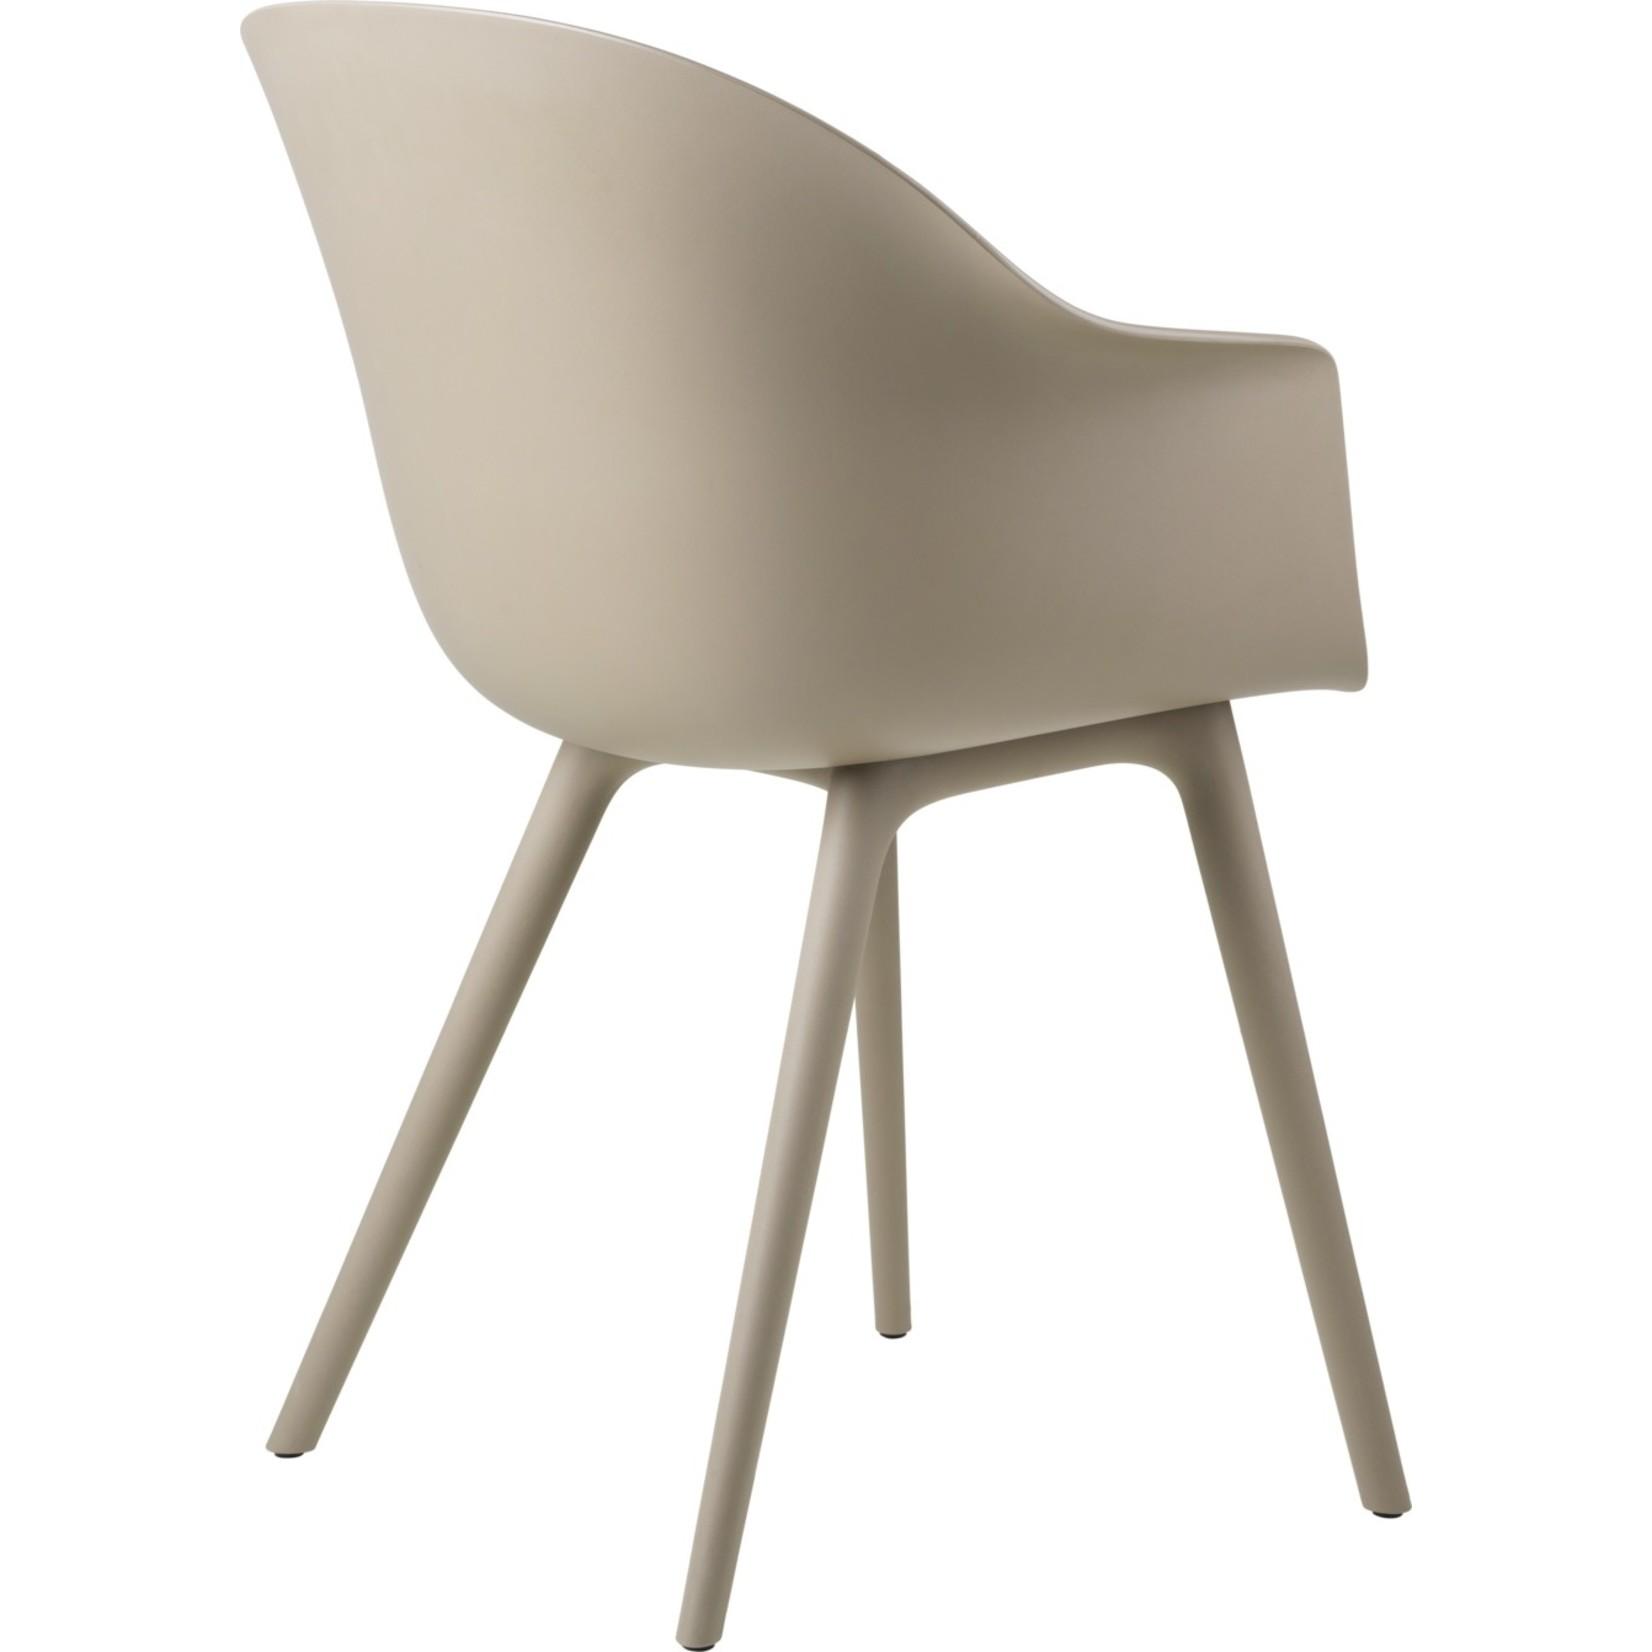 Gubi Bat Dining Chair Outdoor | New Beige